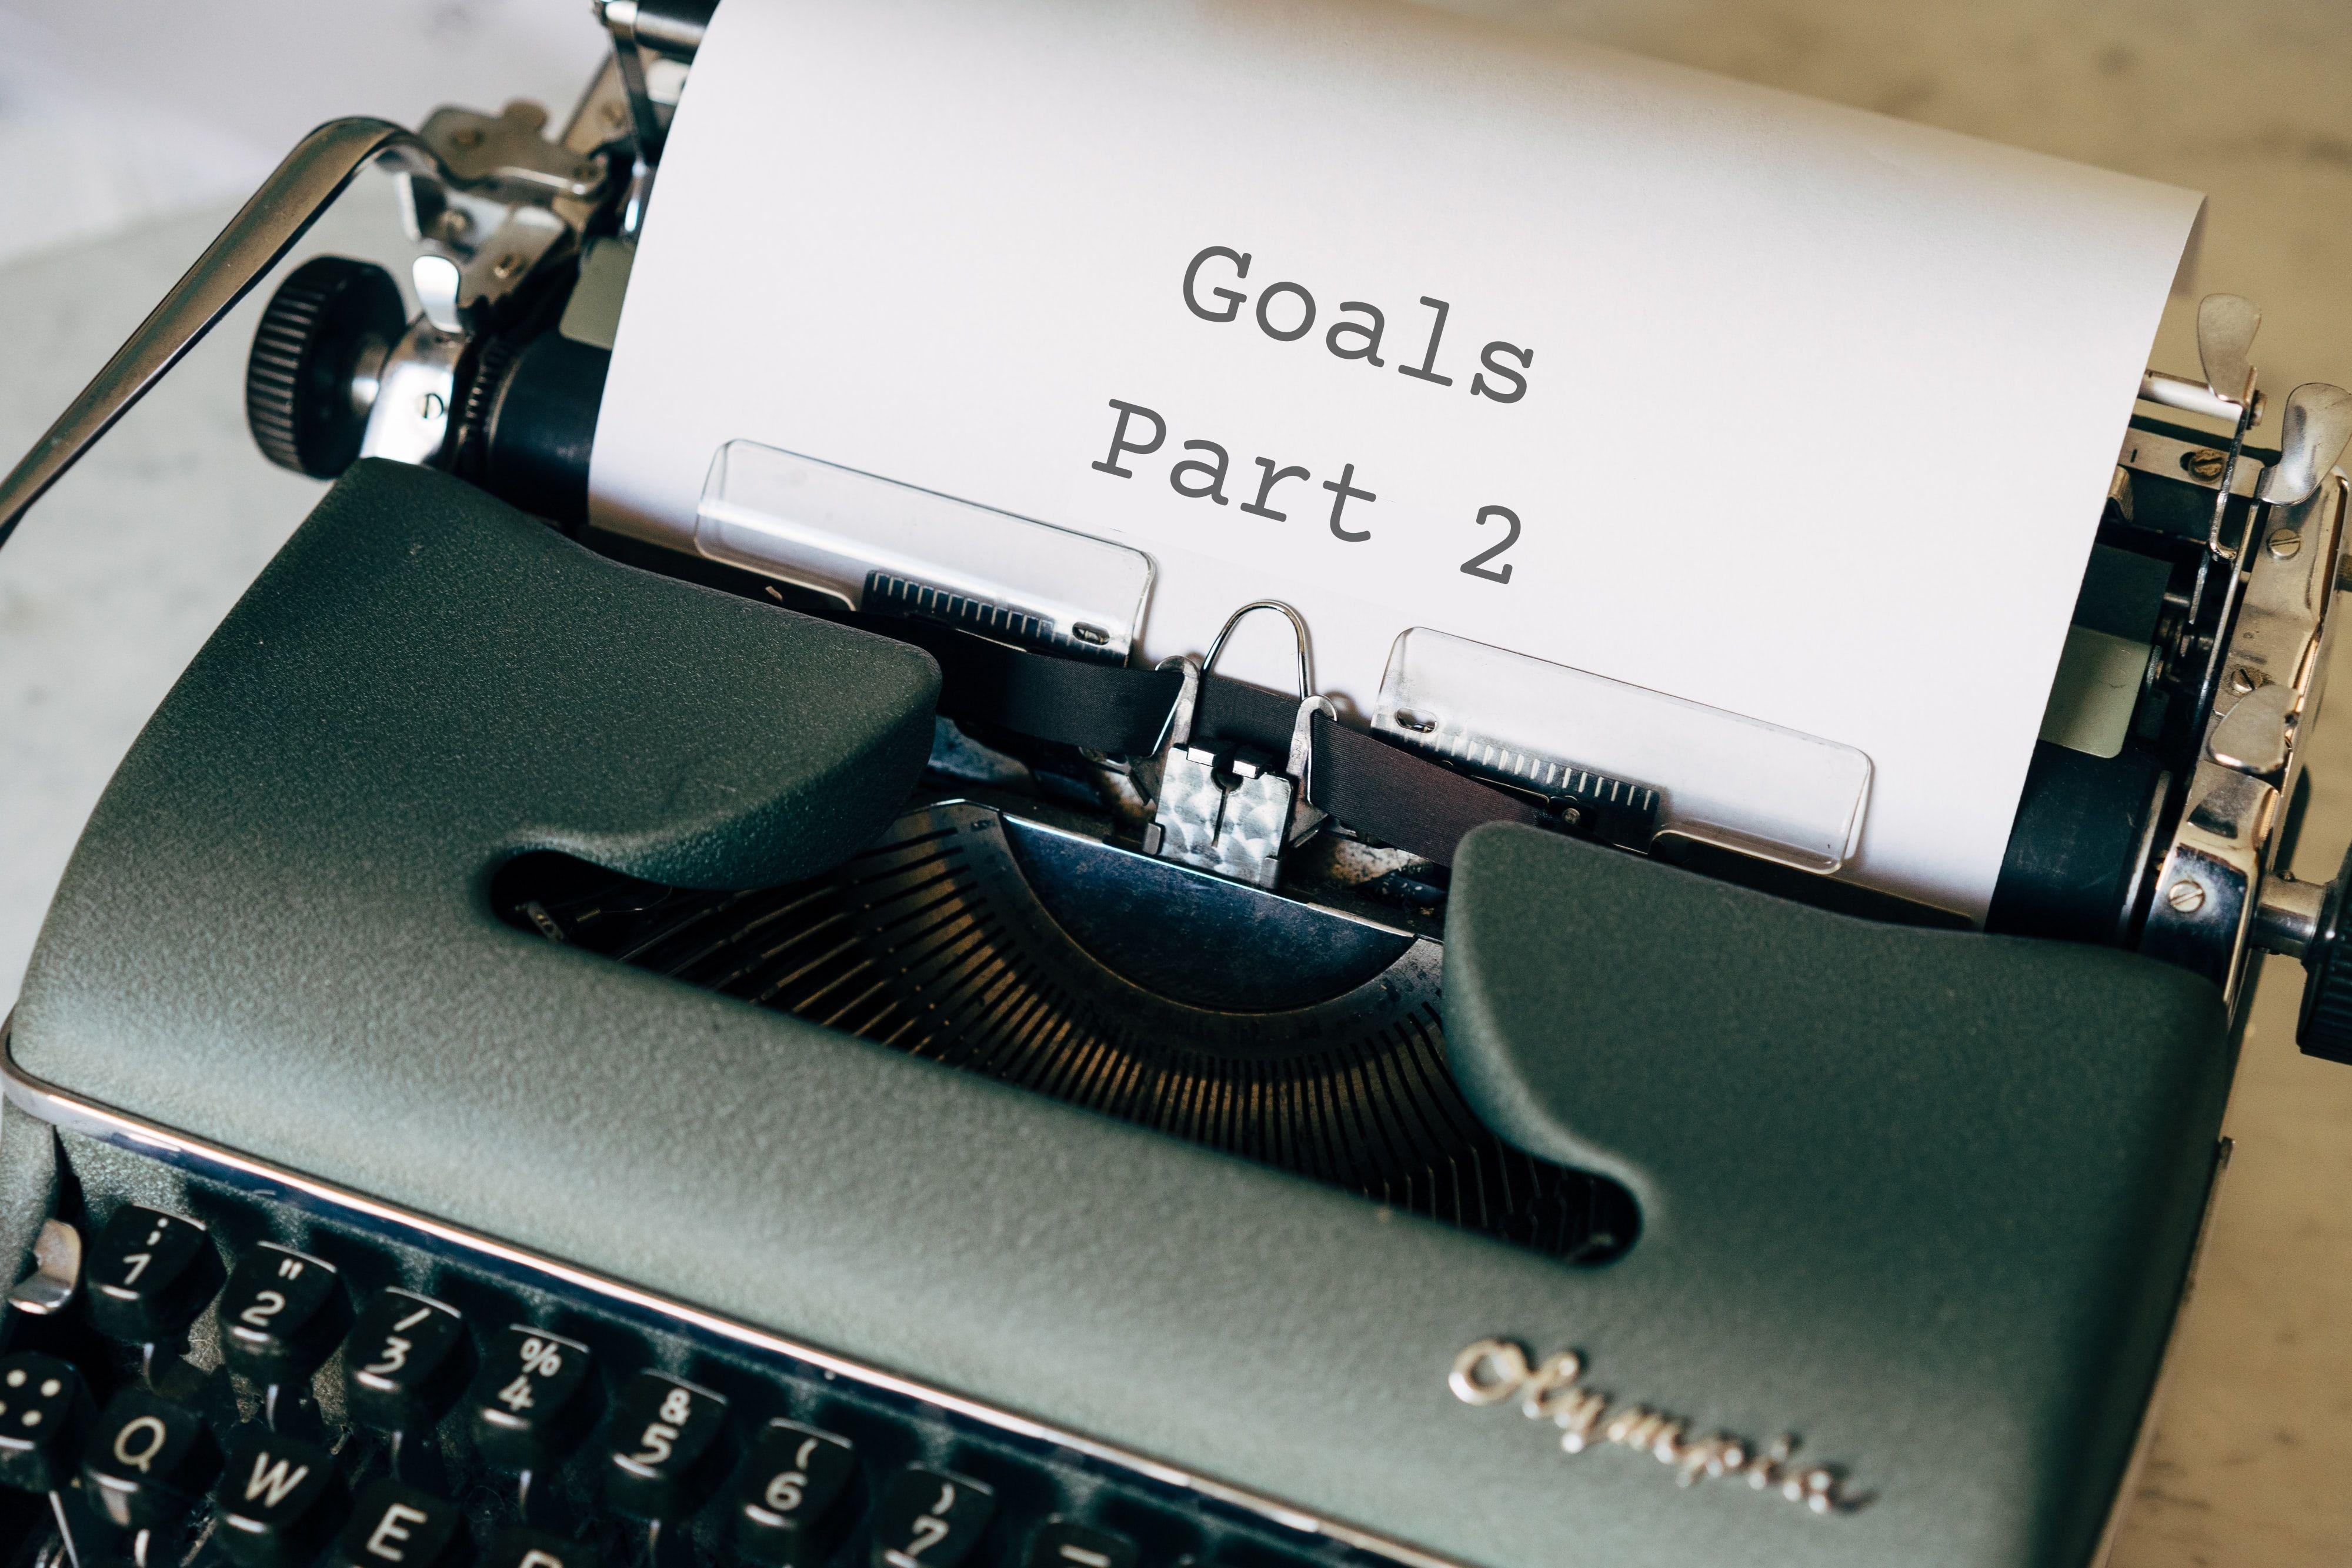 Email Marketing Goals Part 2